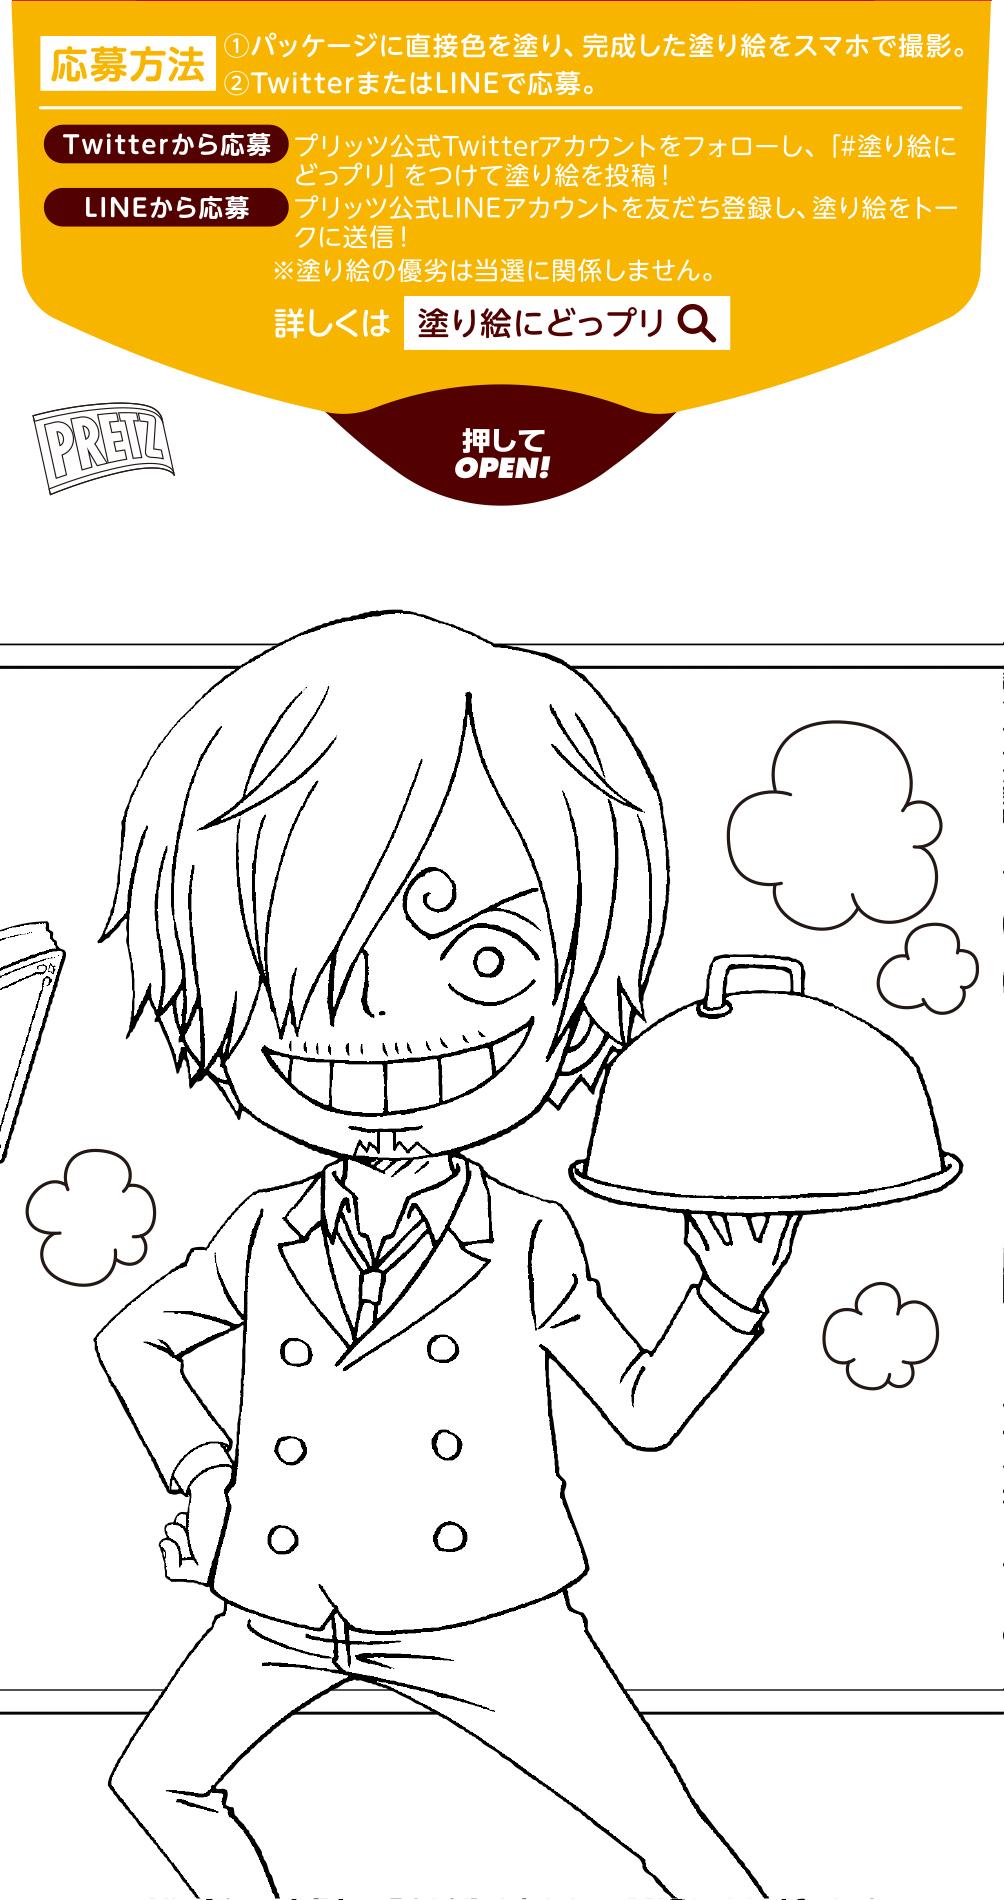 「ONE PIECE」×「プリッツ」初級_サンジ